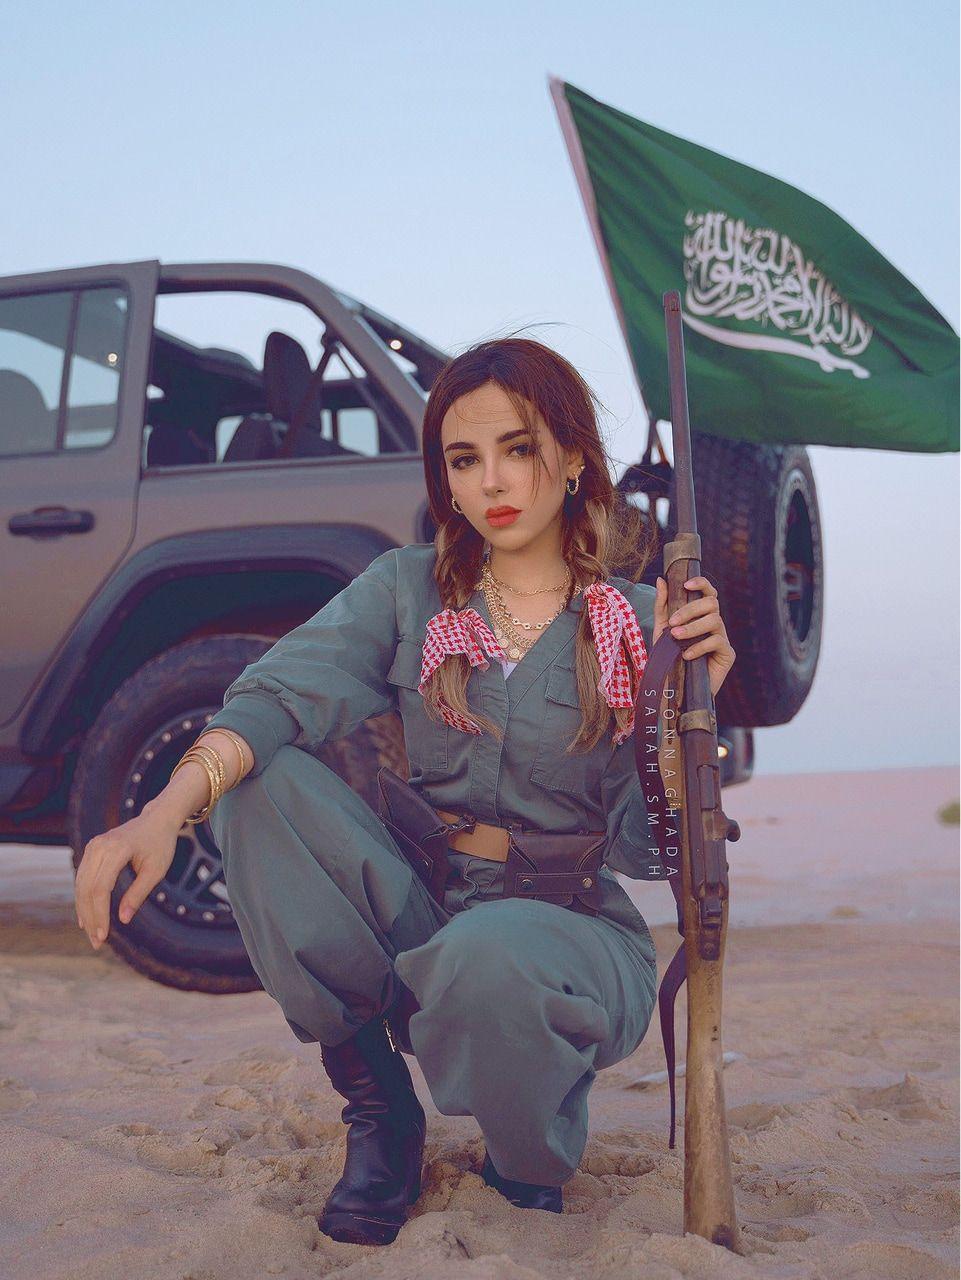 Saudi Arabia Girl Saudi Girls Women Saudiarabia السعودية بنات In 2021 Girl Photo Poses Cute Summer Wallpapers Cute Friend Pictures